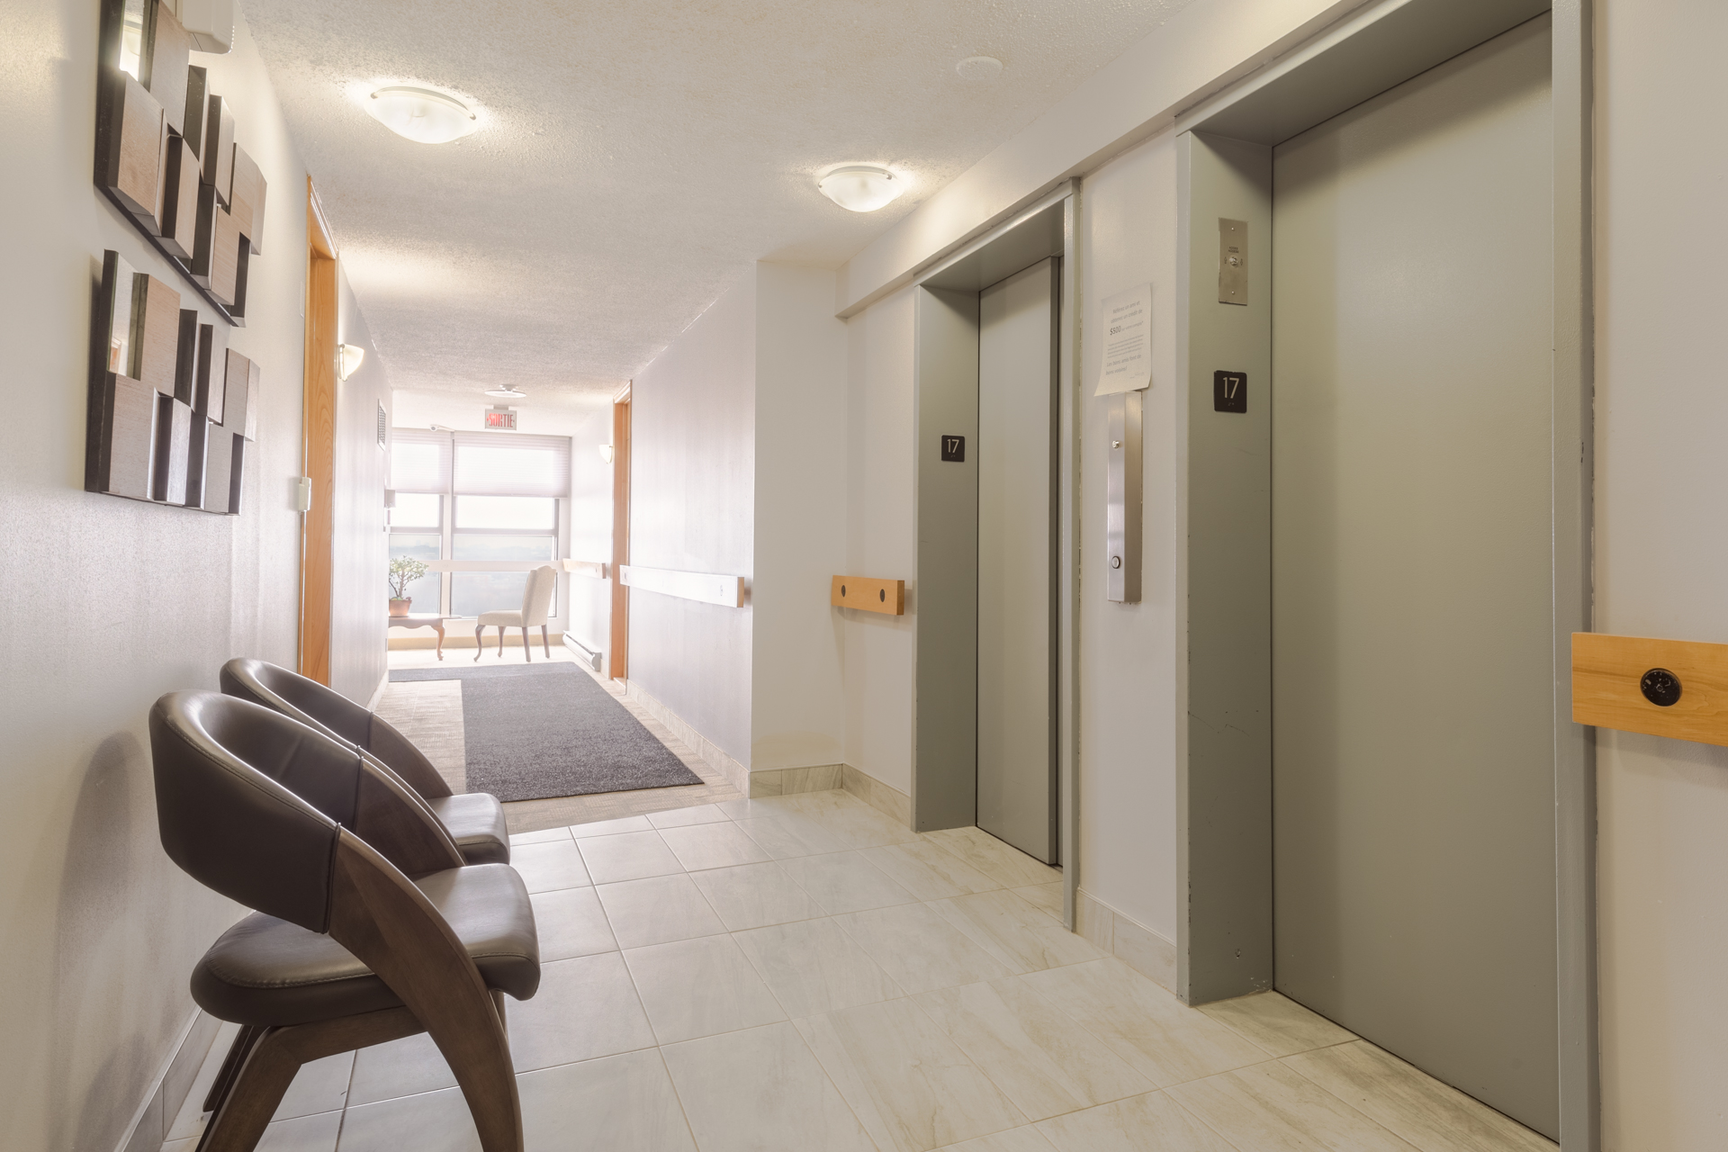 1 bedroom Apartments for rent in Laval at Le Quatre Cent - Photo 28 - RentersPages – L407183